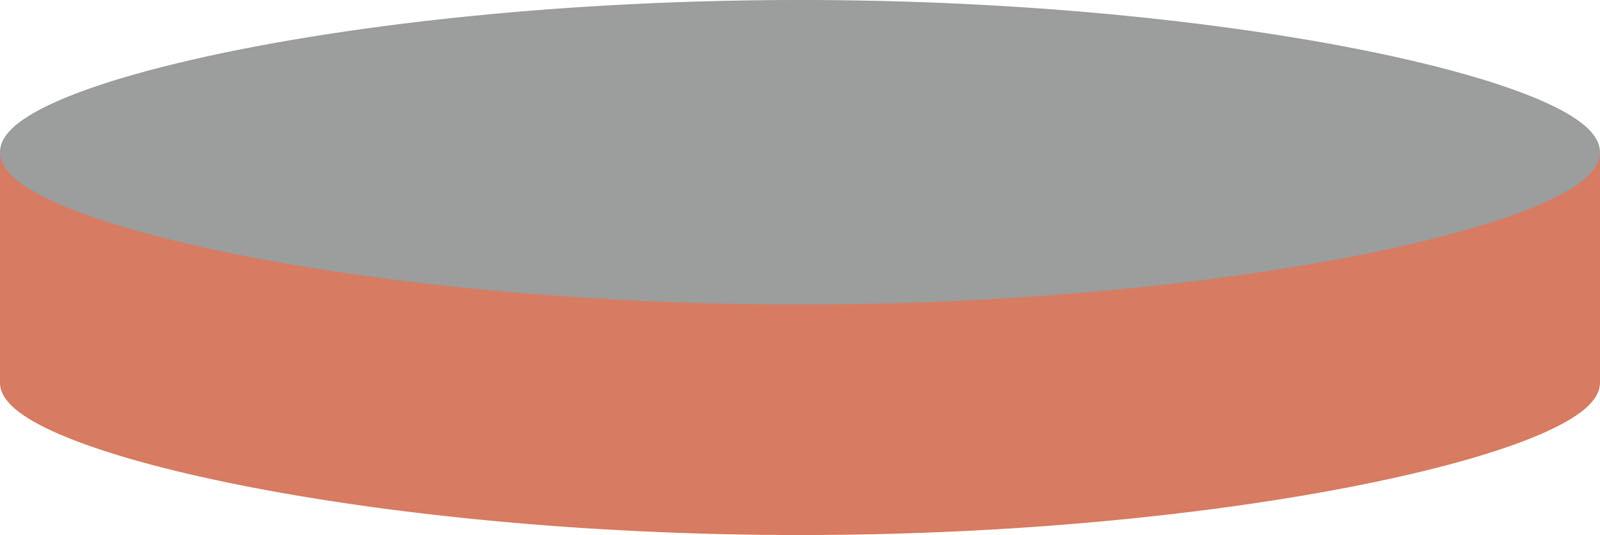 Mg SK N18-L,si, Bu r/PTFE gr, 50°, 1,5